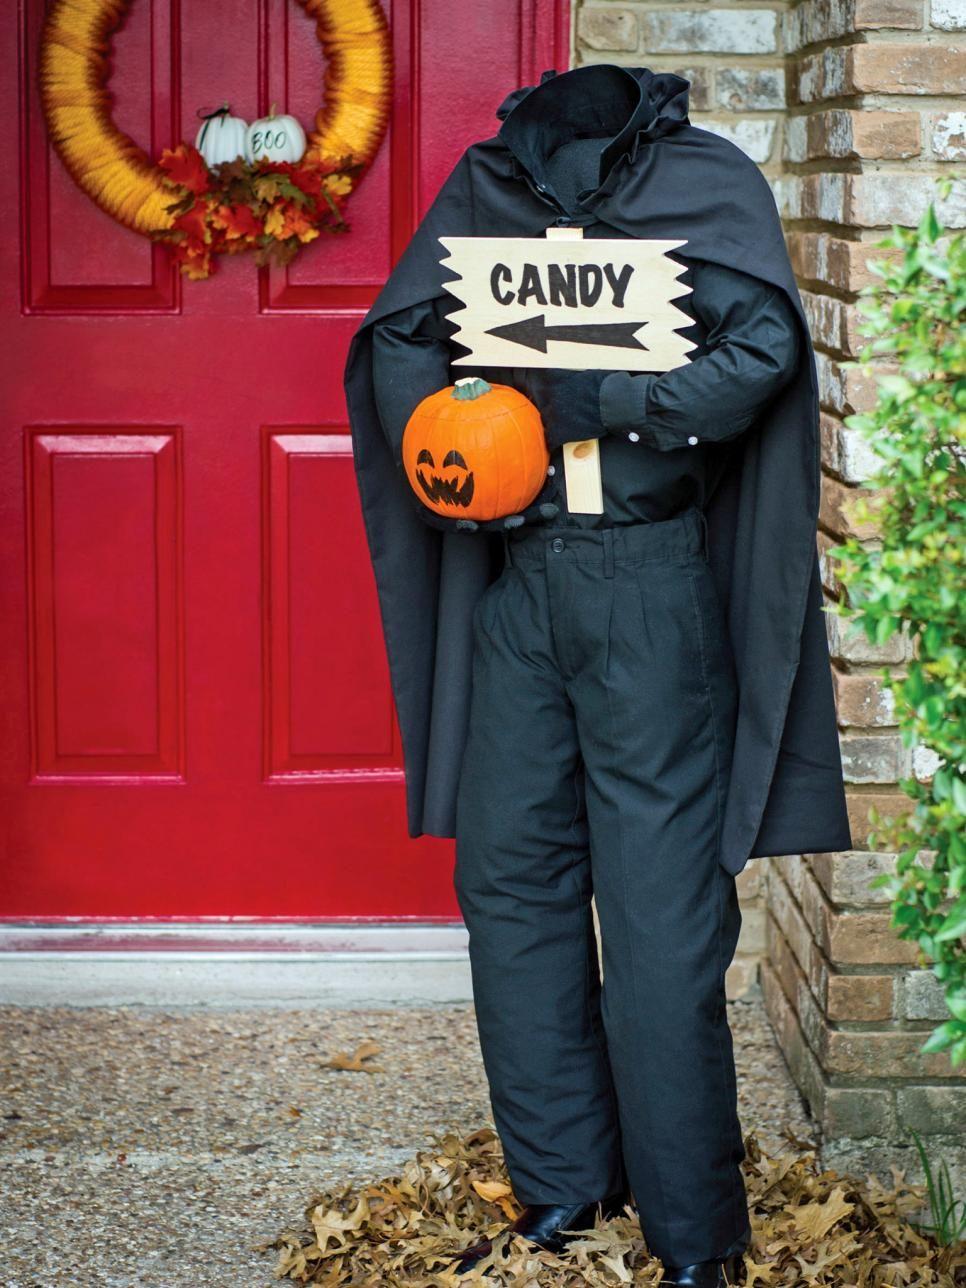 Indoor halloween decorating ideas easyday - 25 Cute Halloween Decorations Ideas